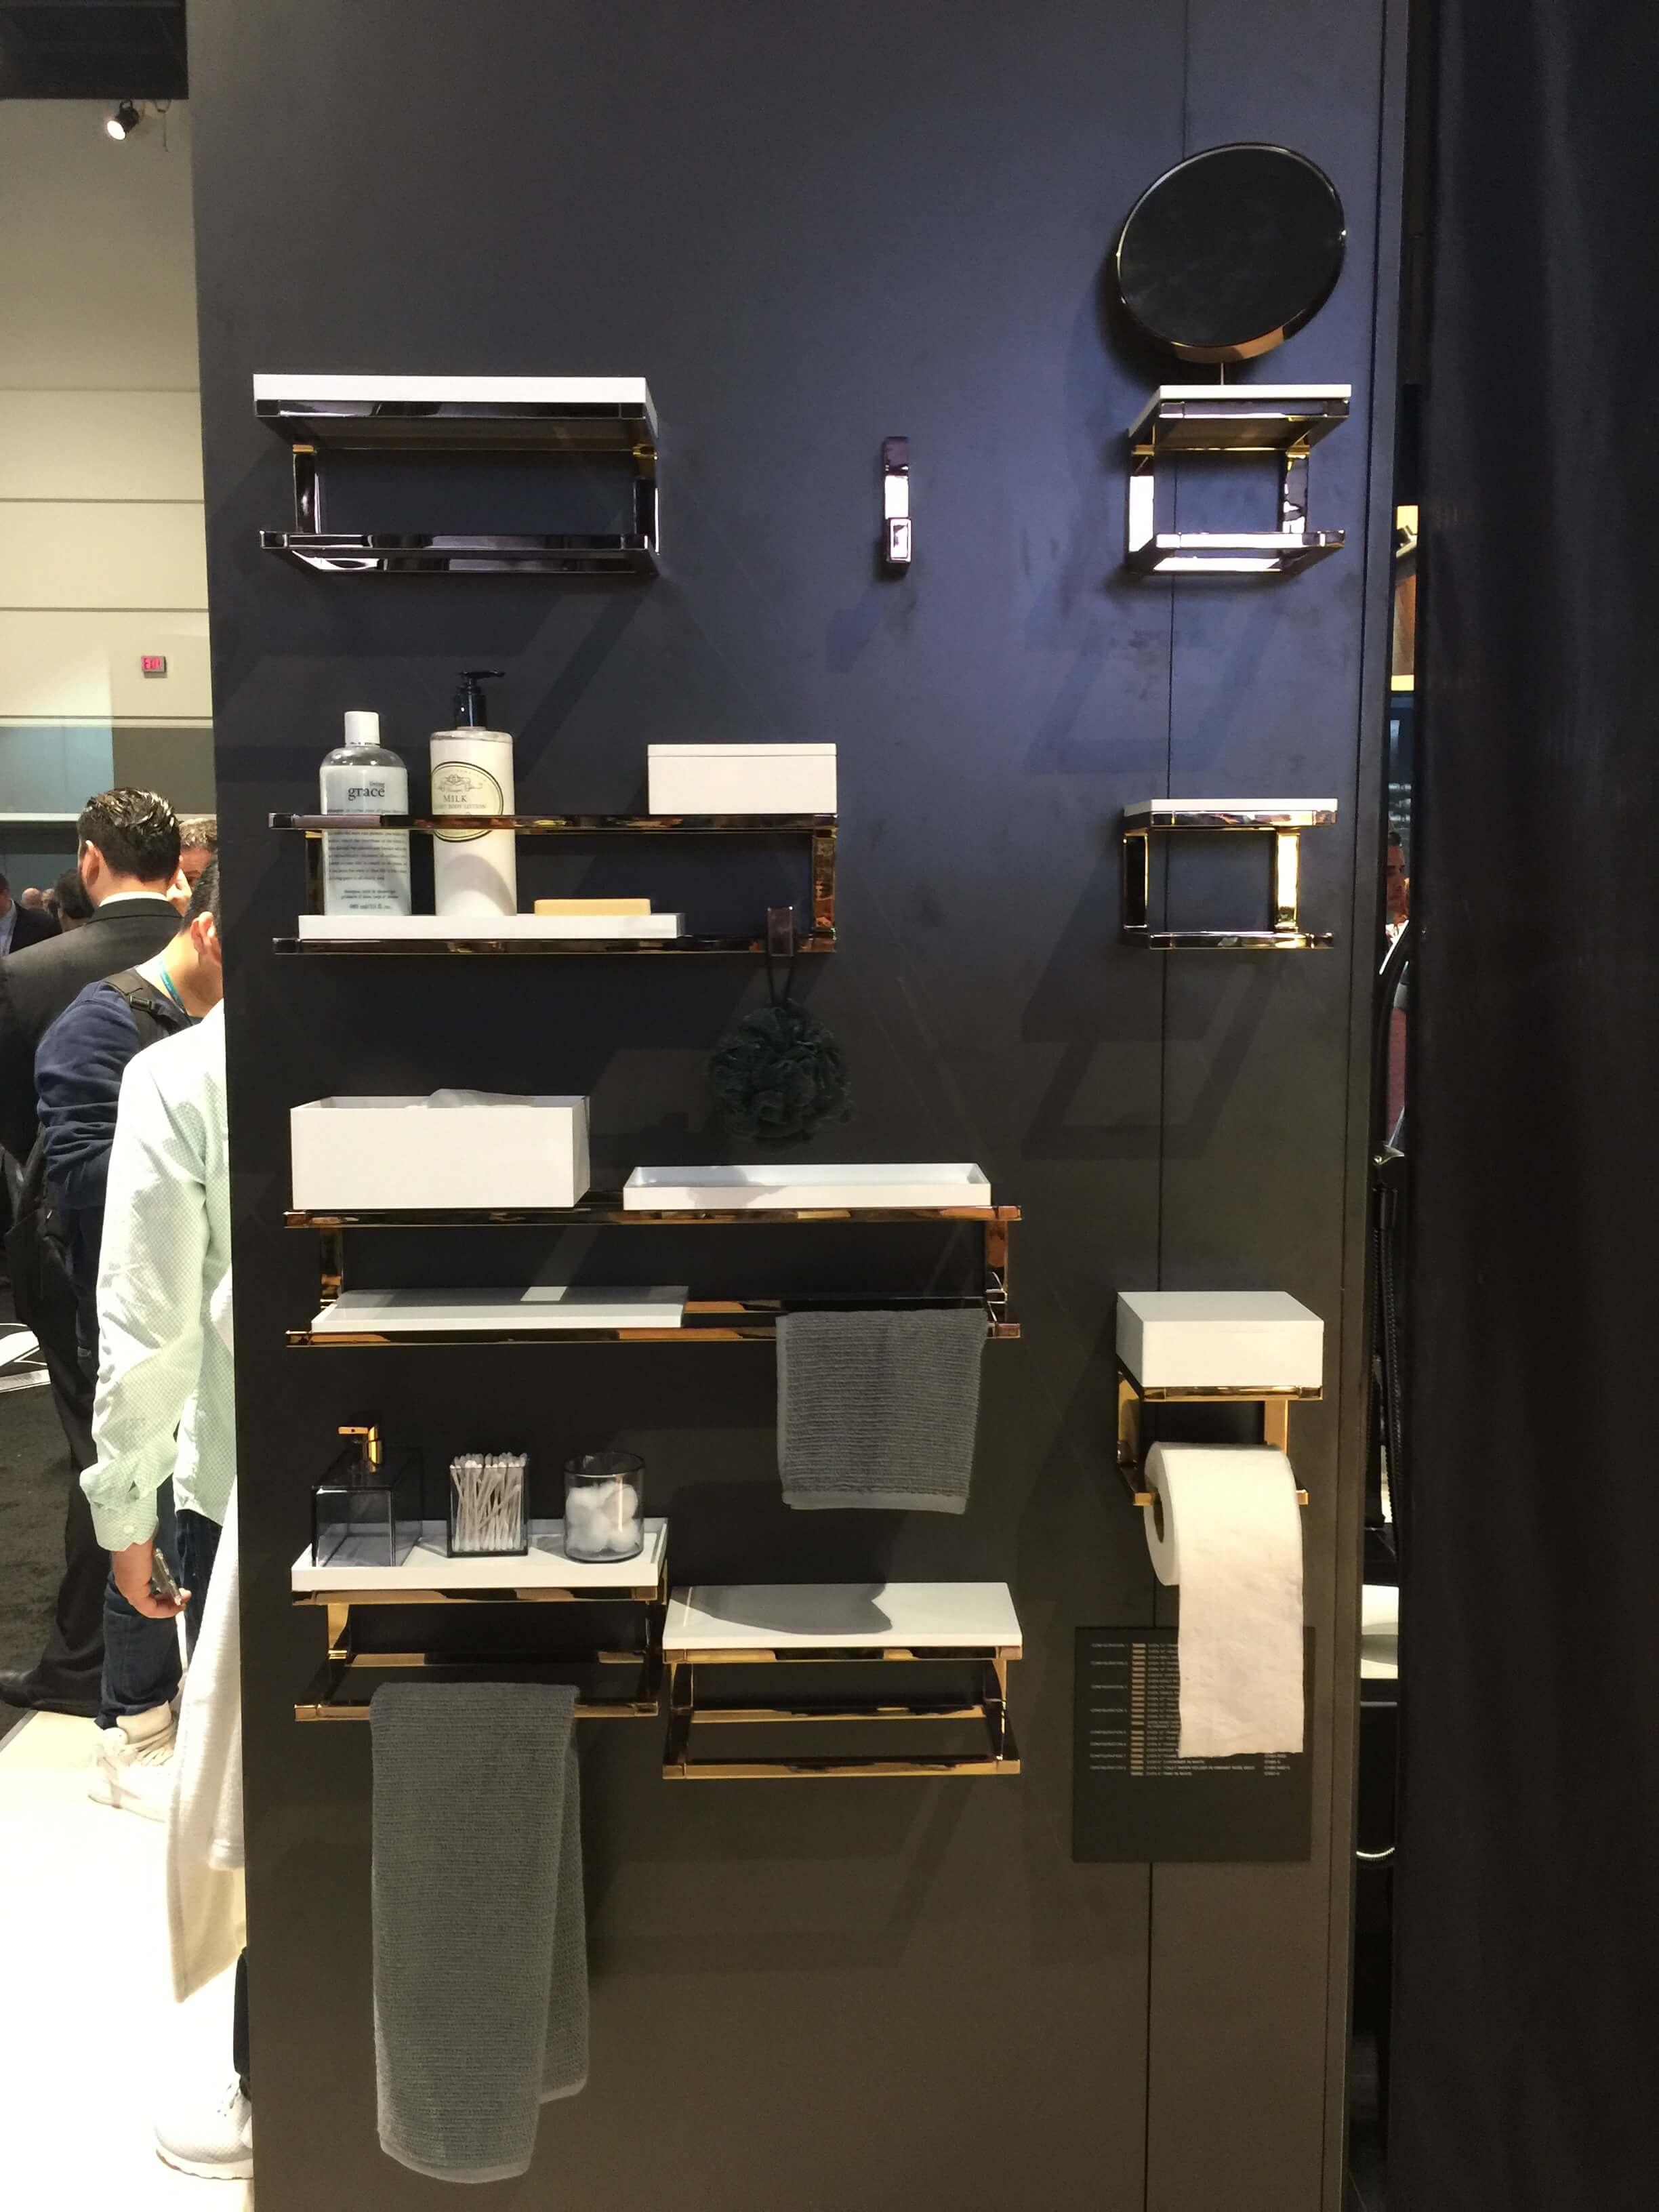 New bath accessories line from Kohler #towelbar #toiletpaperholder #bathroom